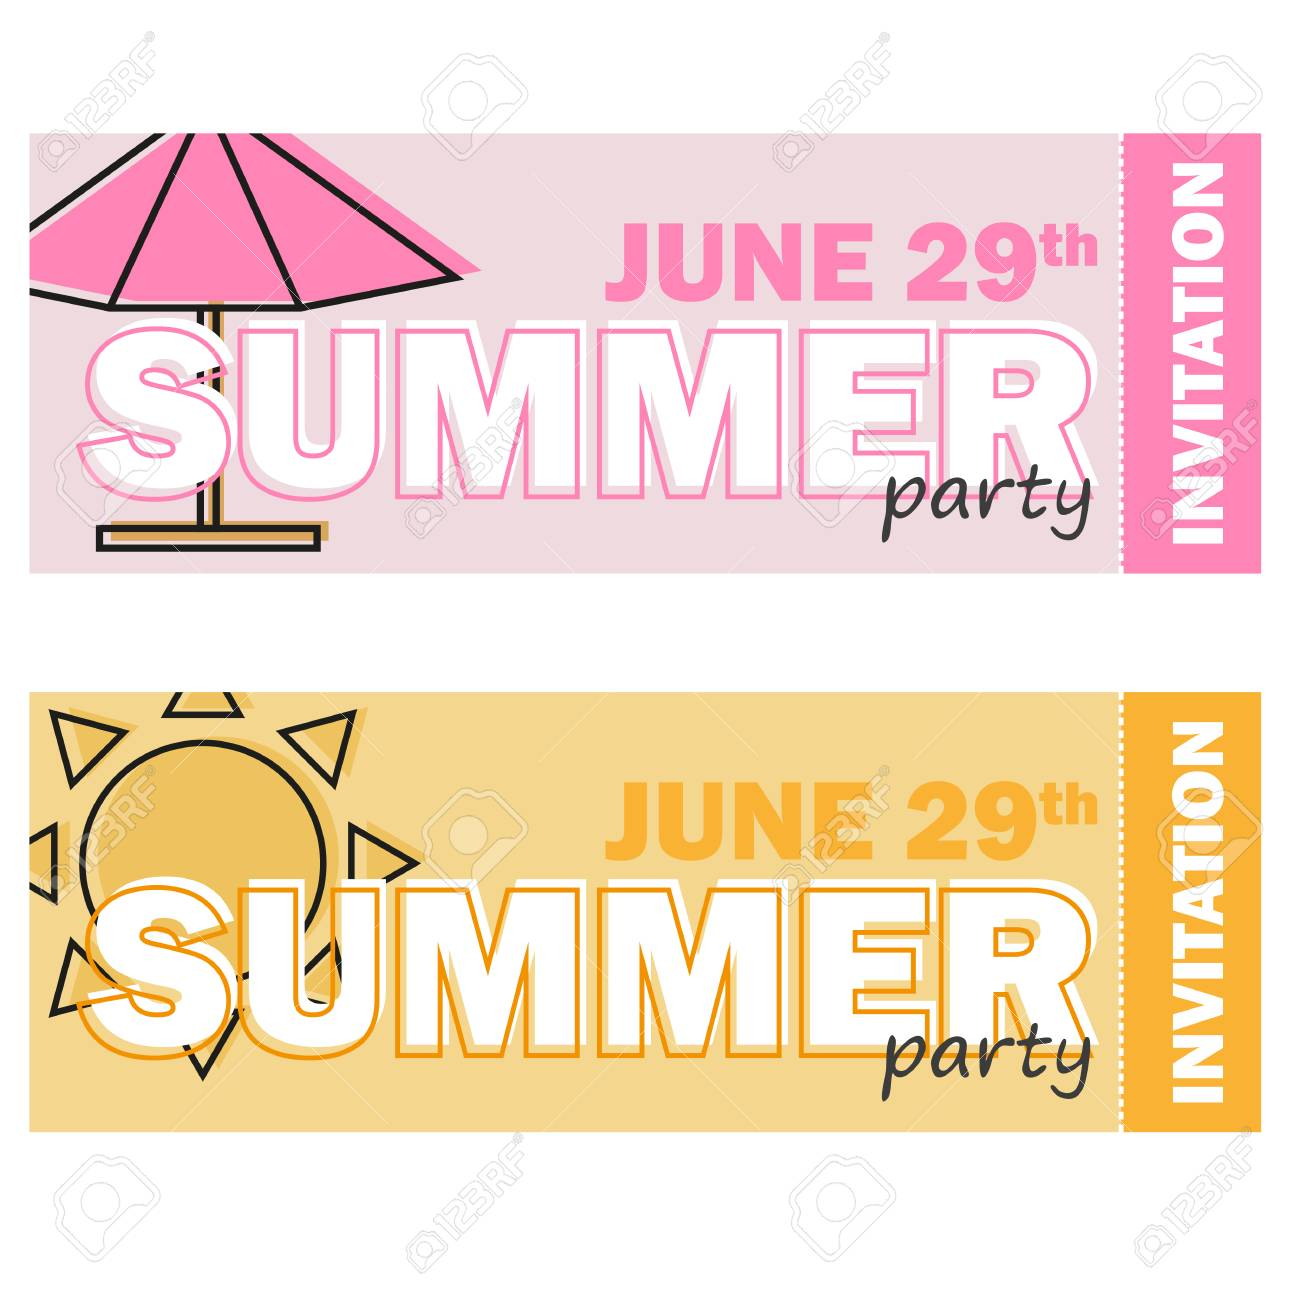 Creative modern flat design invitation on summer party with line creative modern flat design invitation on summer party with line symbol vector illustration stock vector stopboris Images